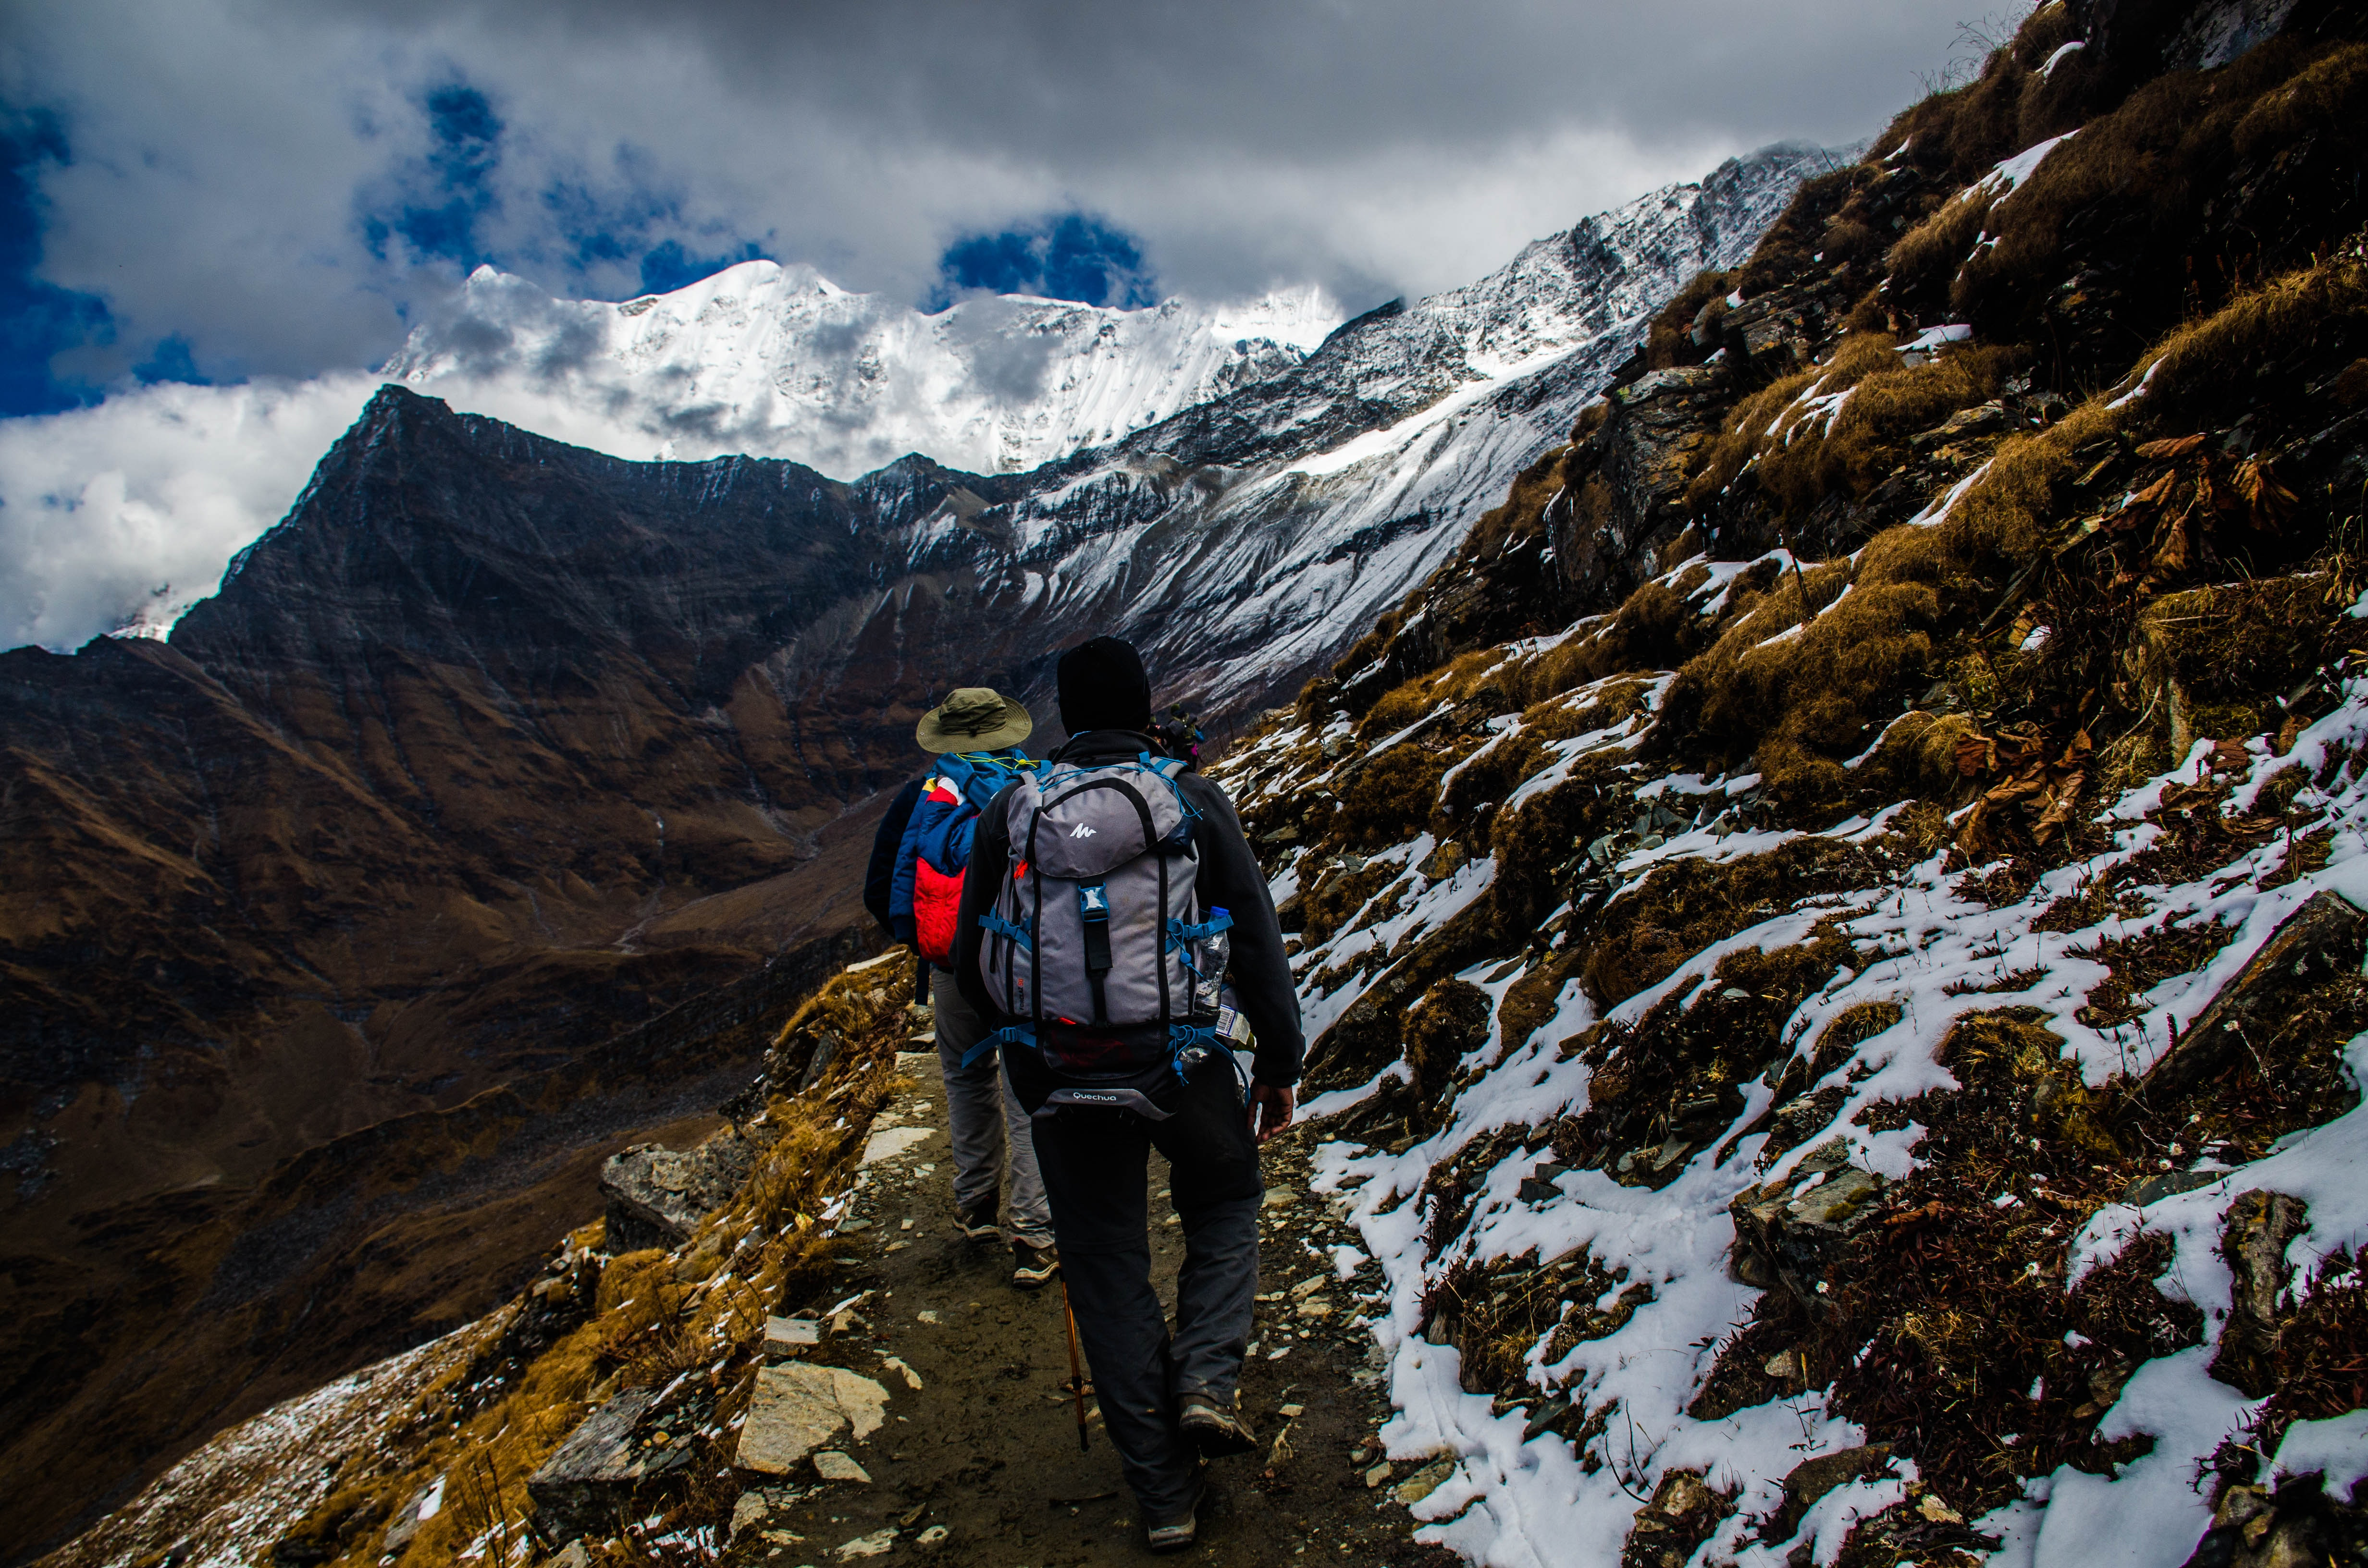 Two Mountaineers in Mountain, Adventure, Mountain peak, Travel, Snow, HQ Photo